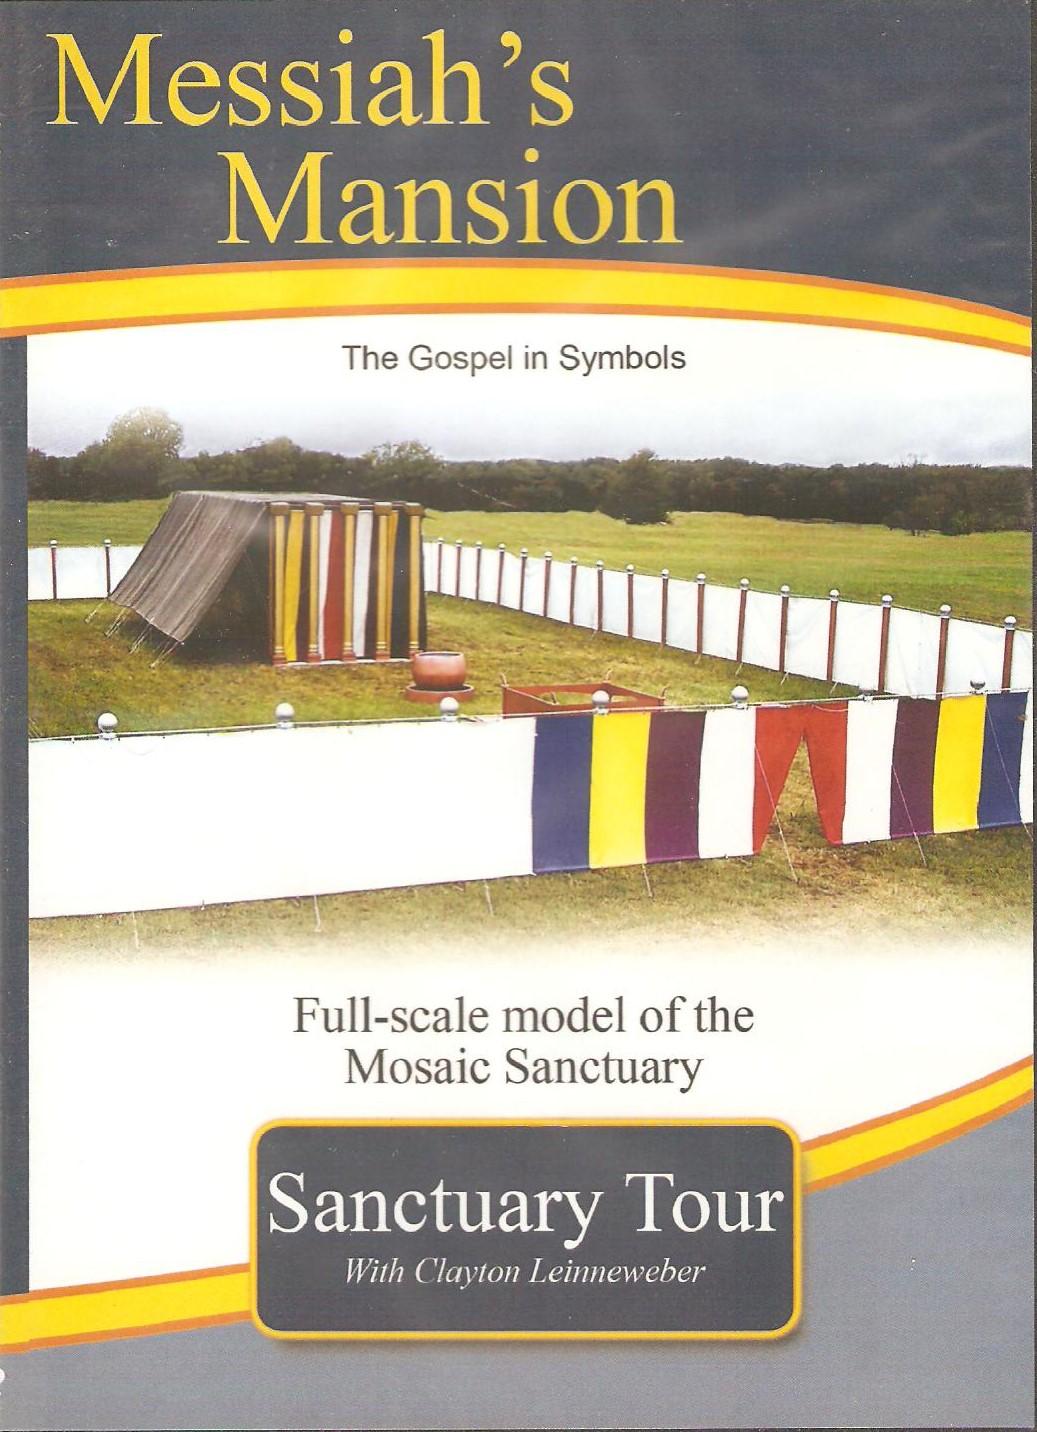 Messiah's Mansion